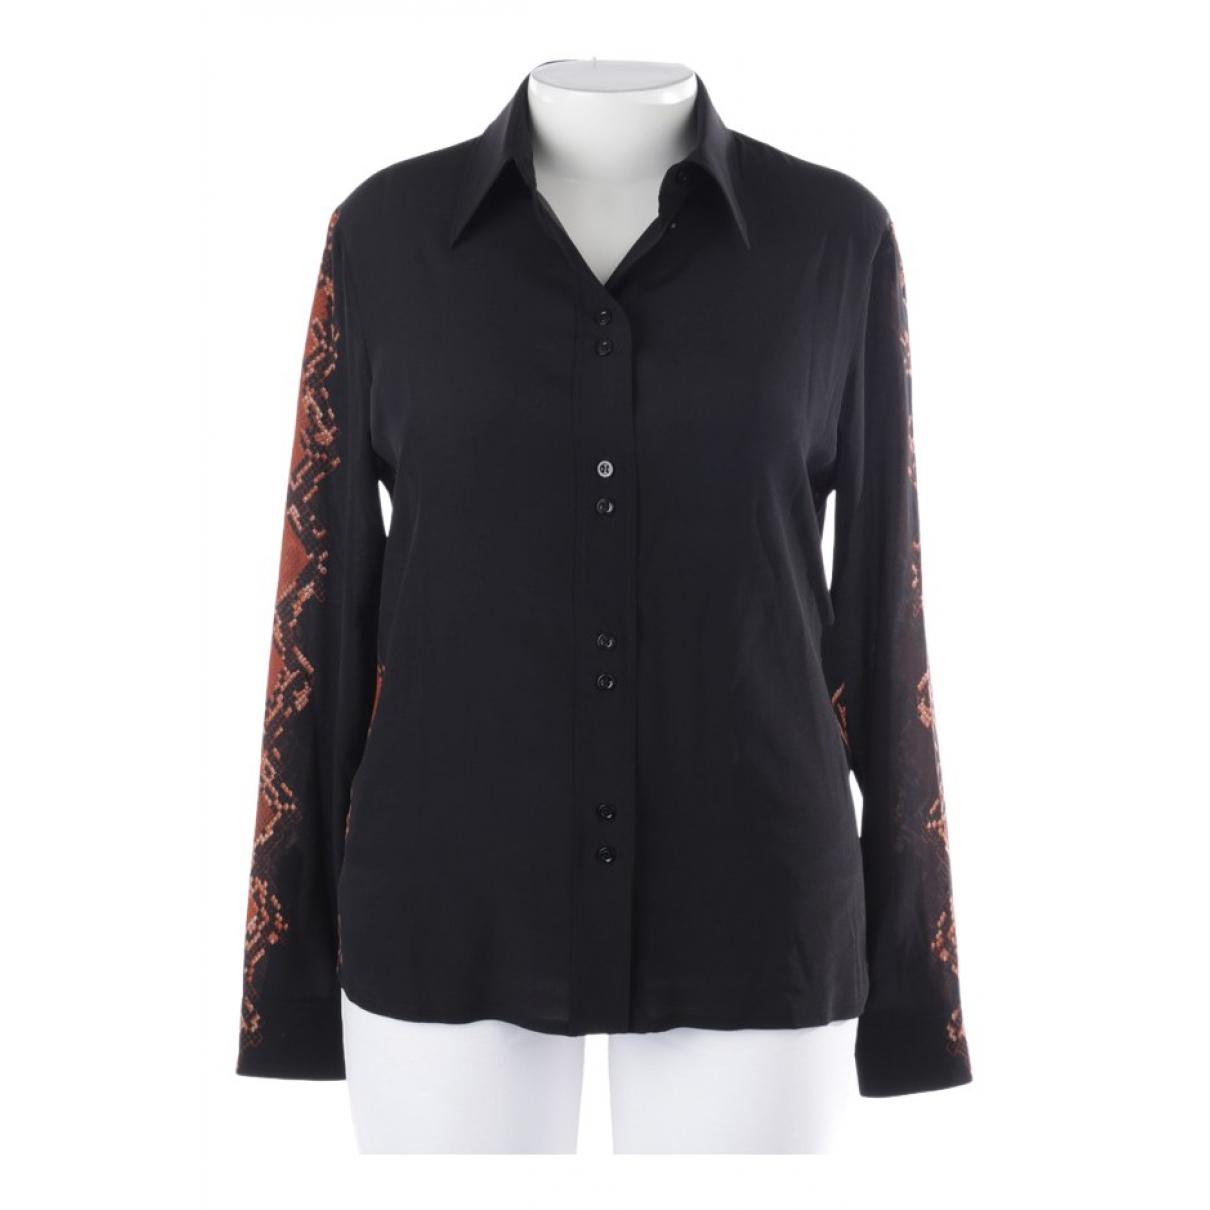 Camiseta de Seda Givenchy